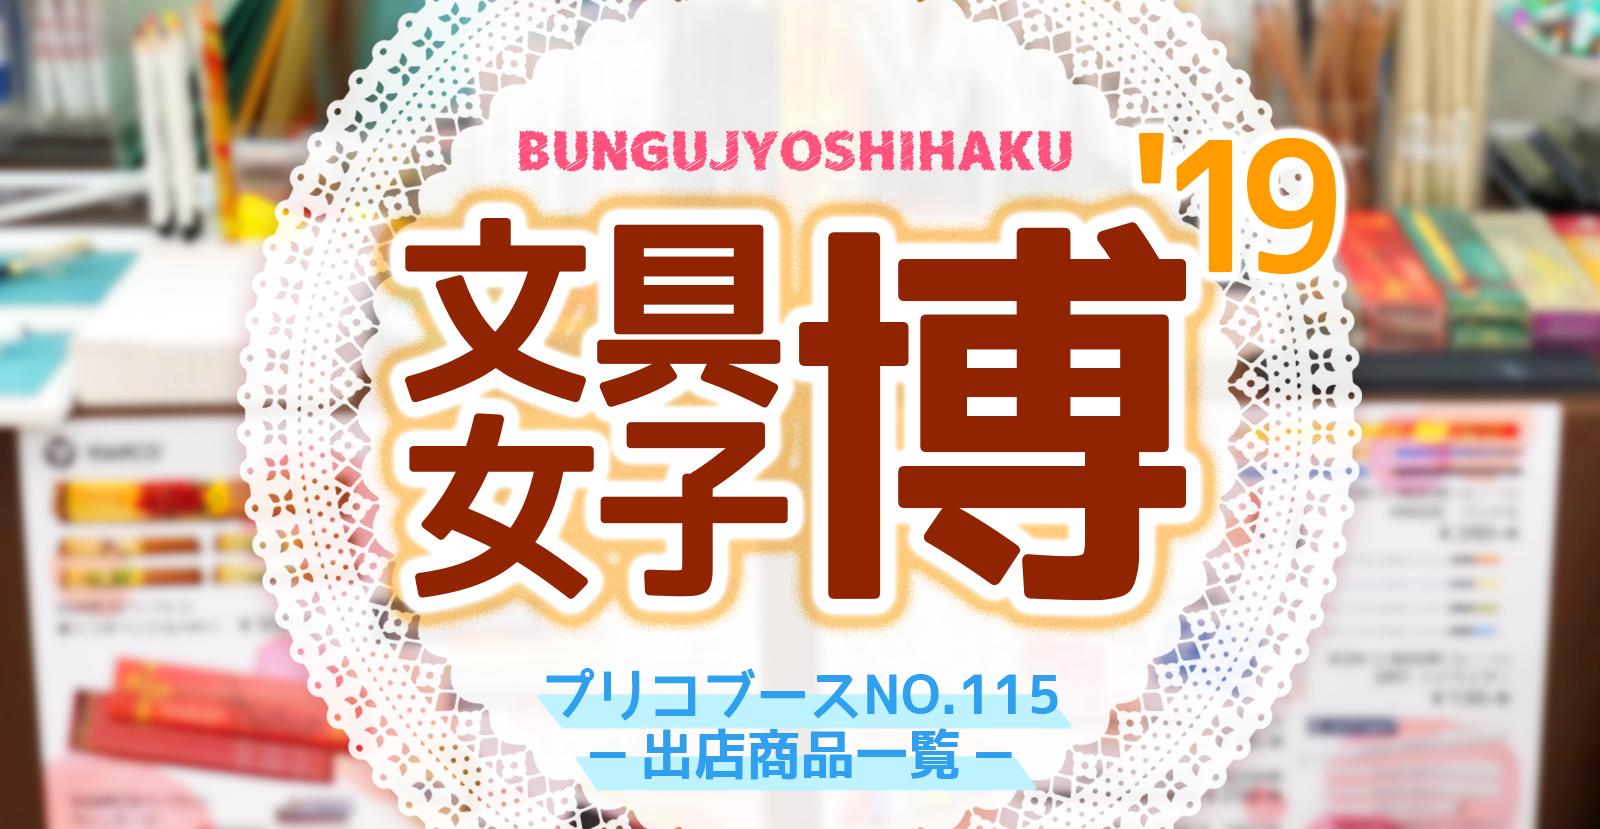 bungujyoshi_TOPbanner02.jpg